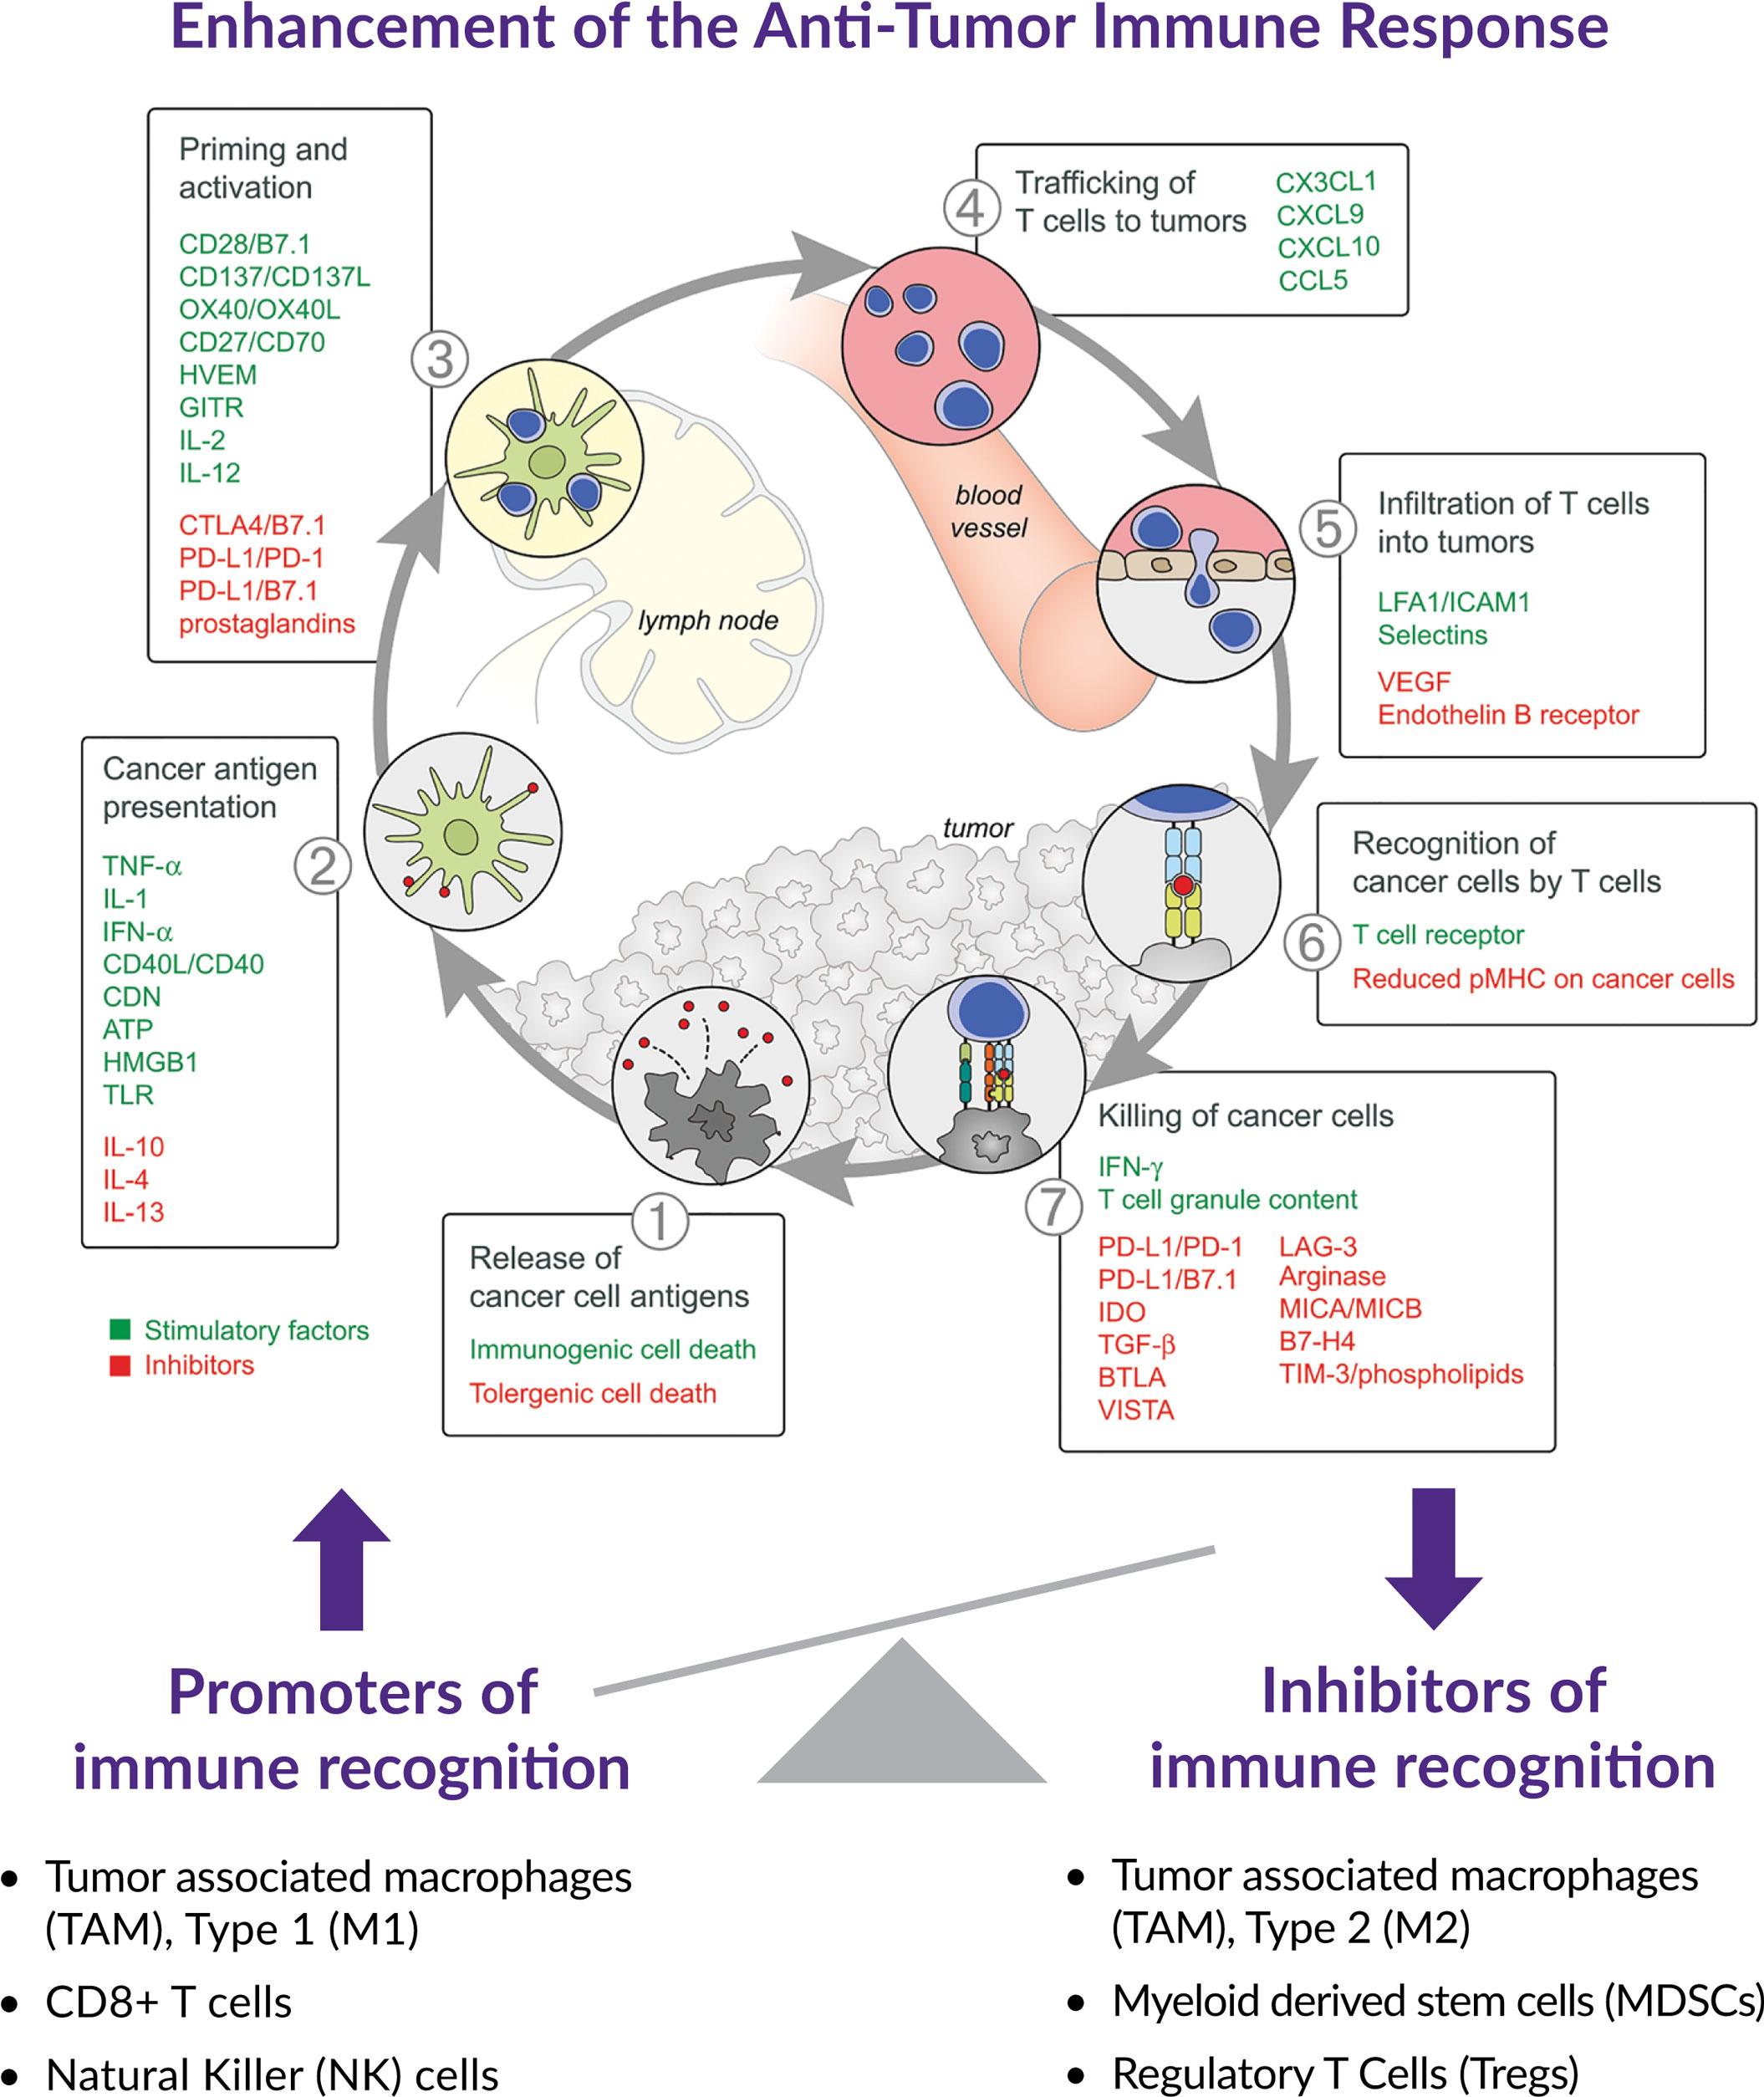 cancer immune cycle enhance - Ситраватиниб: фантастический тирозинкиназный ингибитор